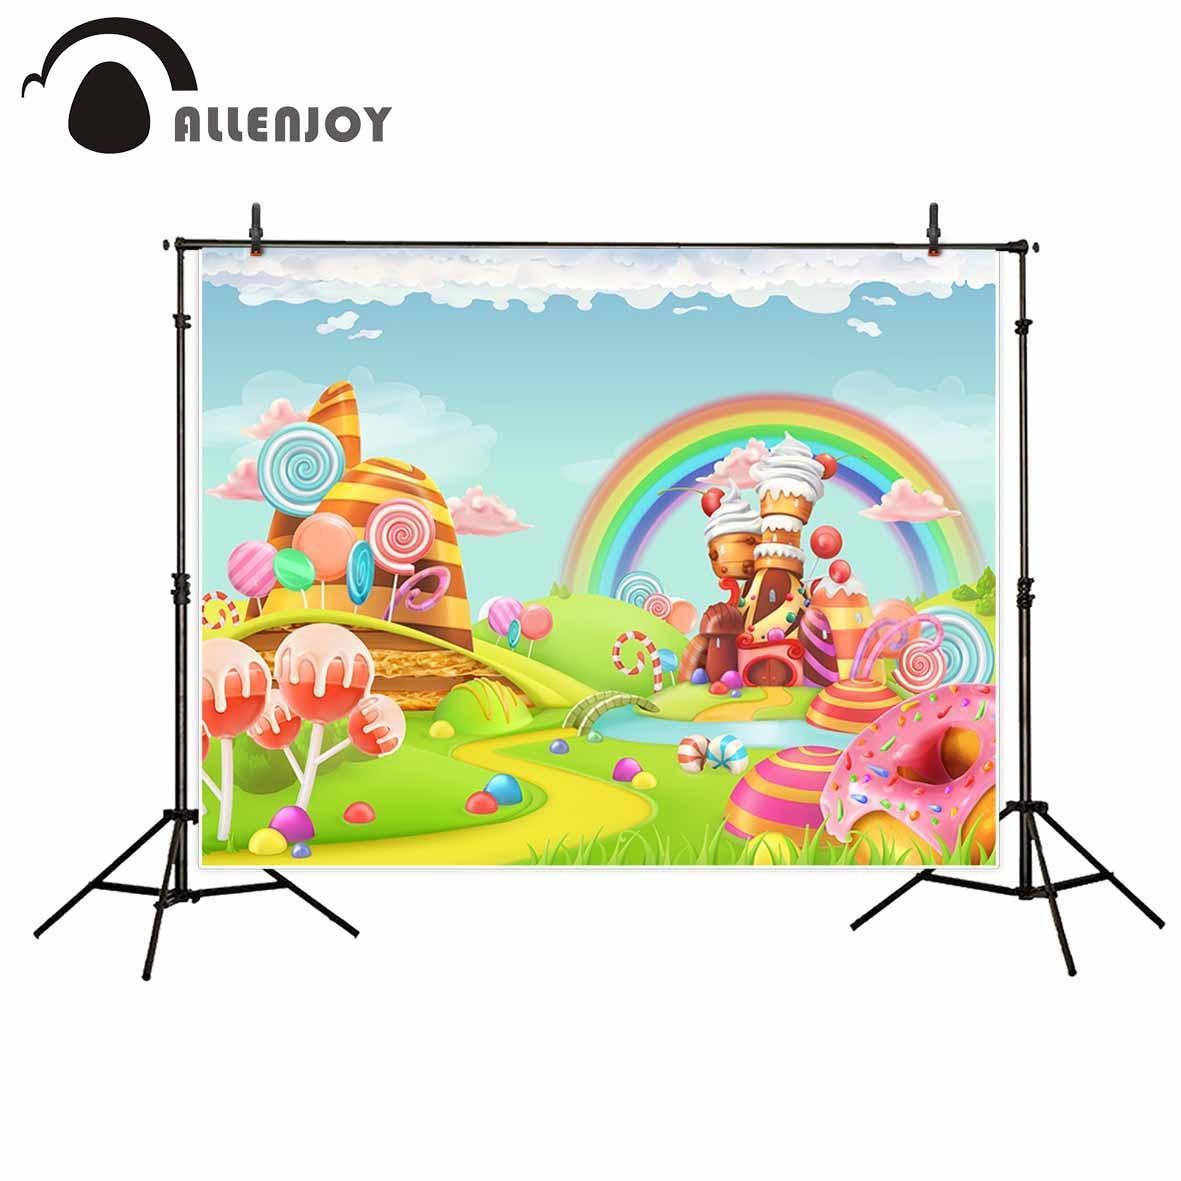 Us 945 32 Offallenjoy Photography Backdrop Rainbow Cartoon Candy House Child Fairy Tale Background Newborn Original Design For Photo Studio In